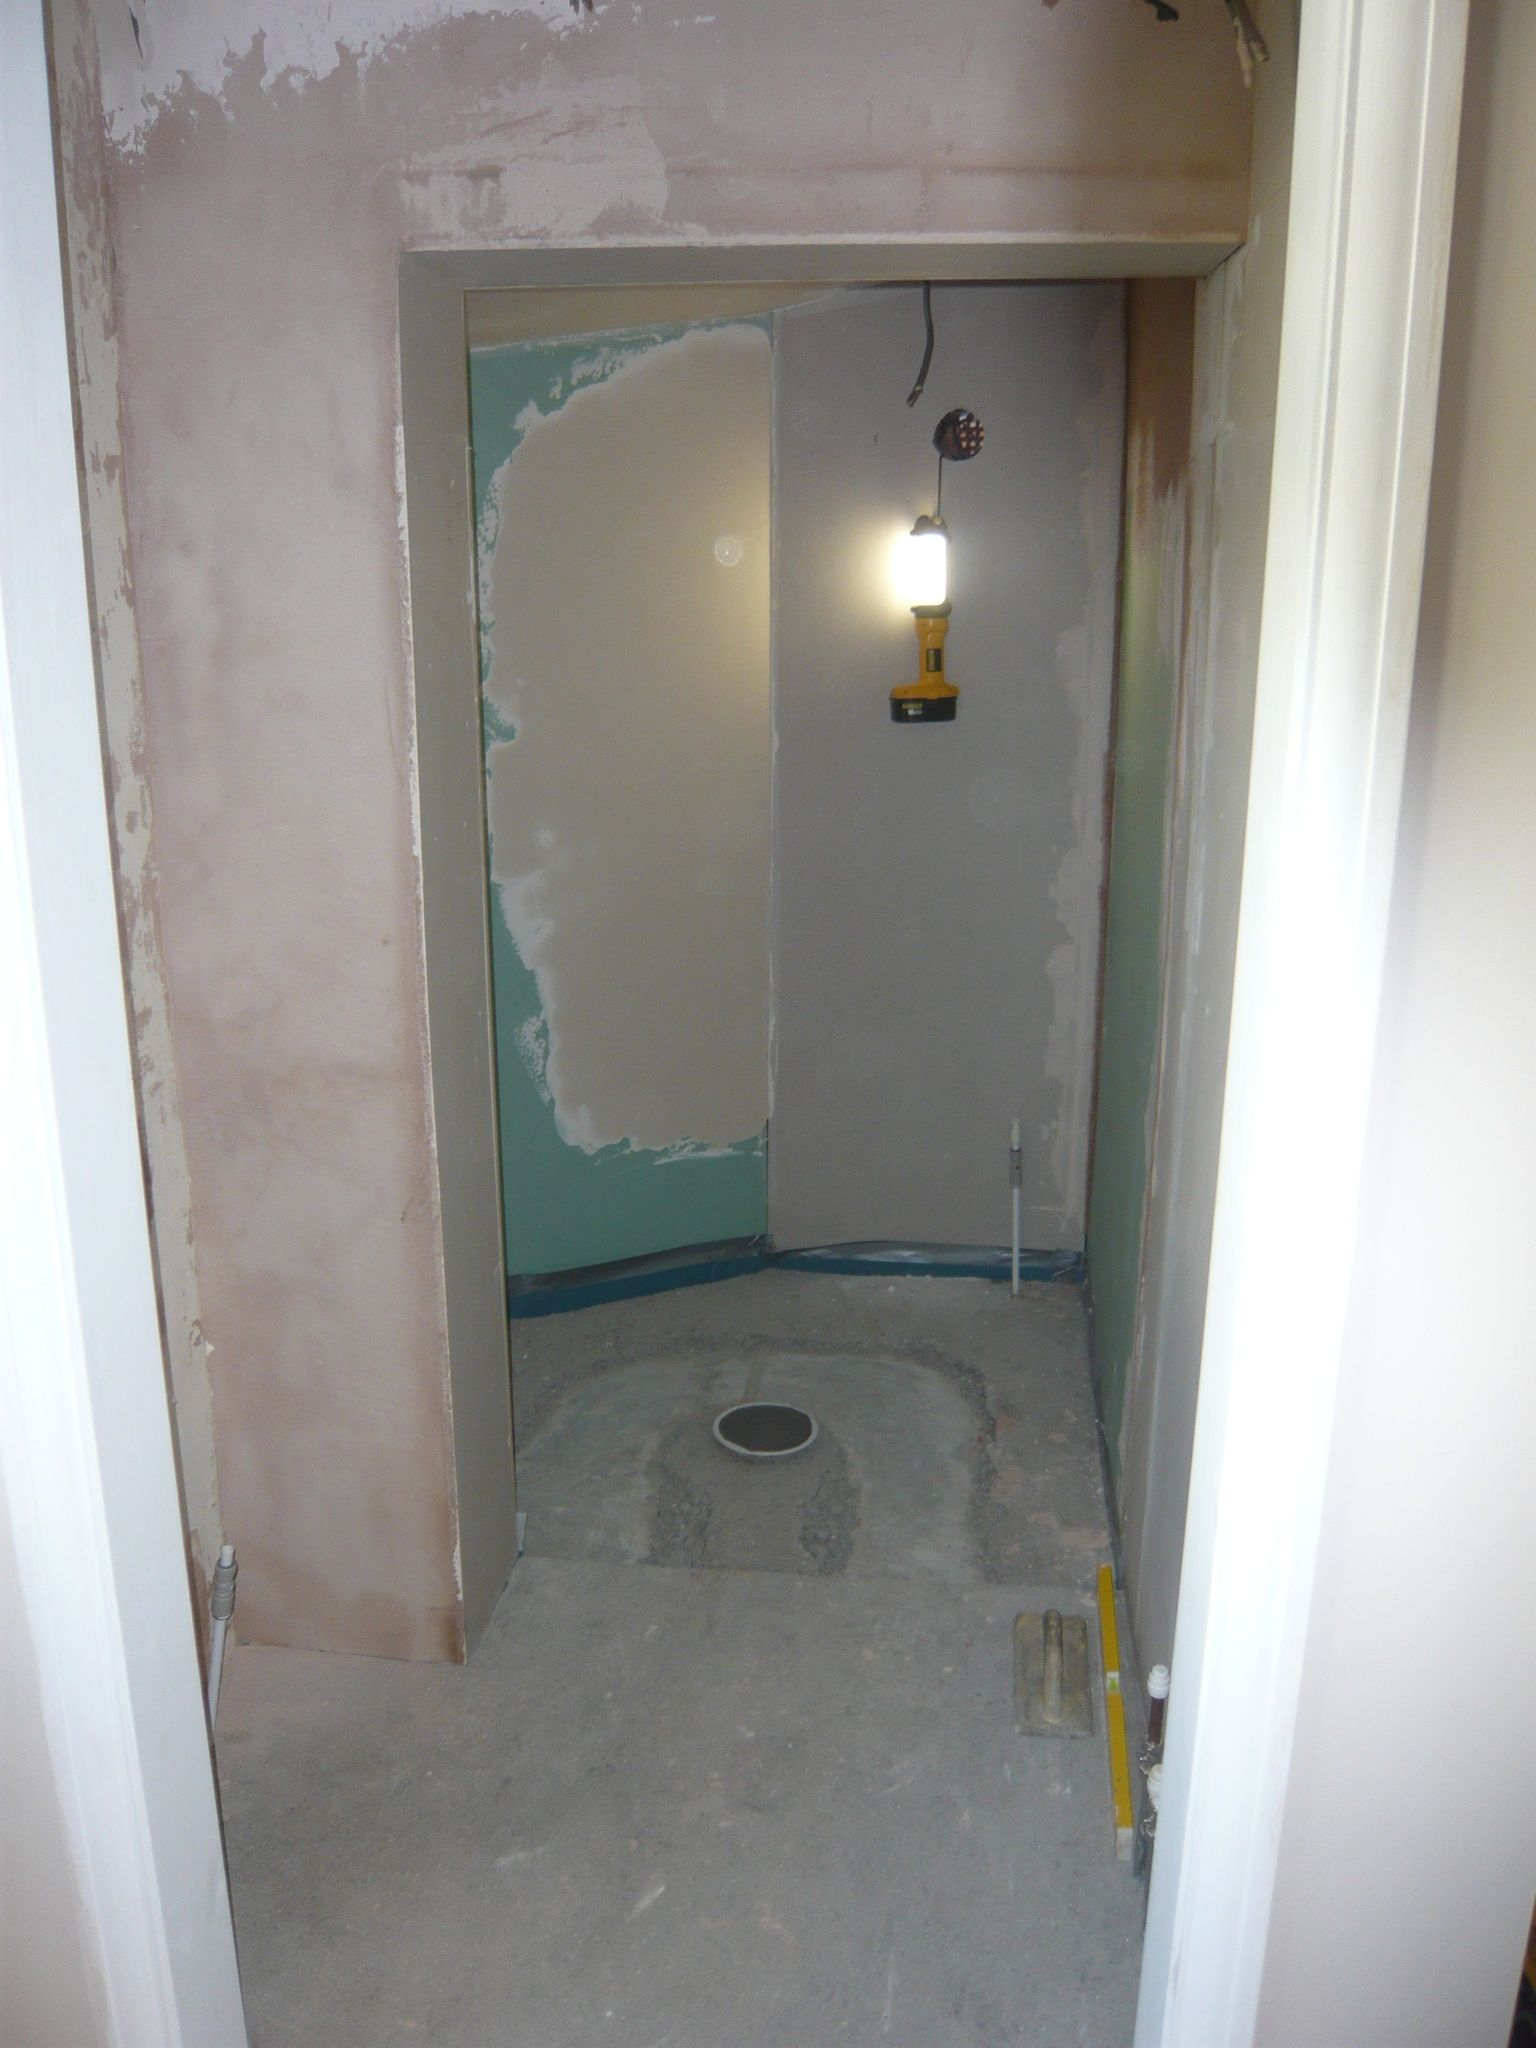 Creation of wet floor area, with damp proof membrane.